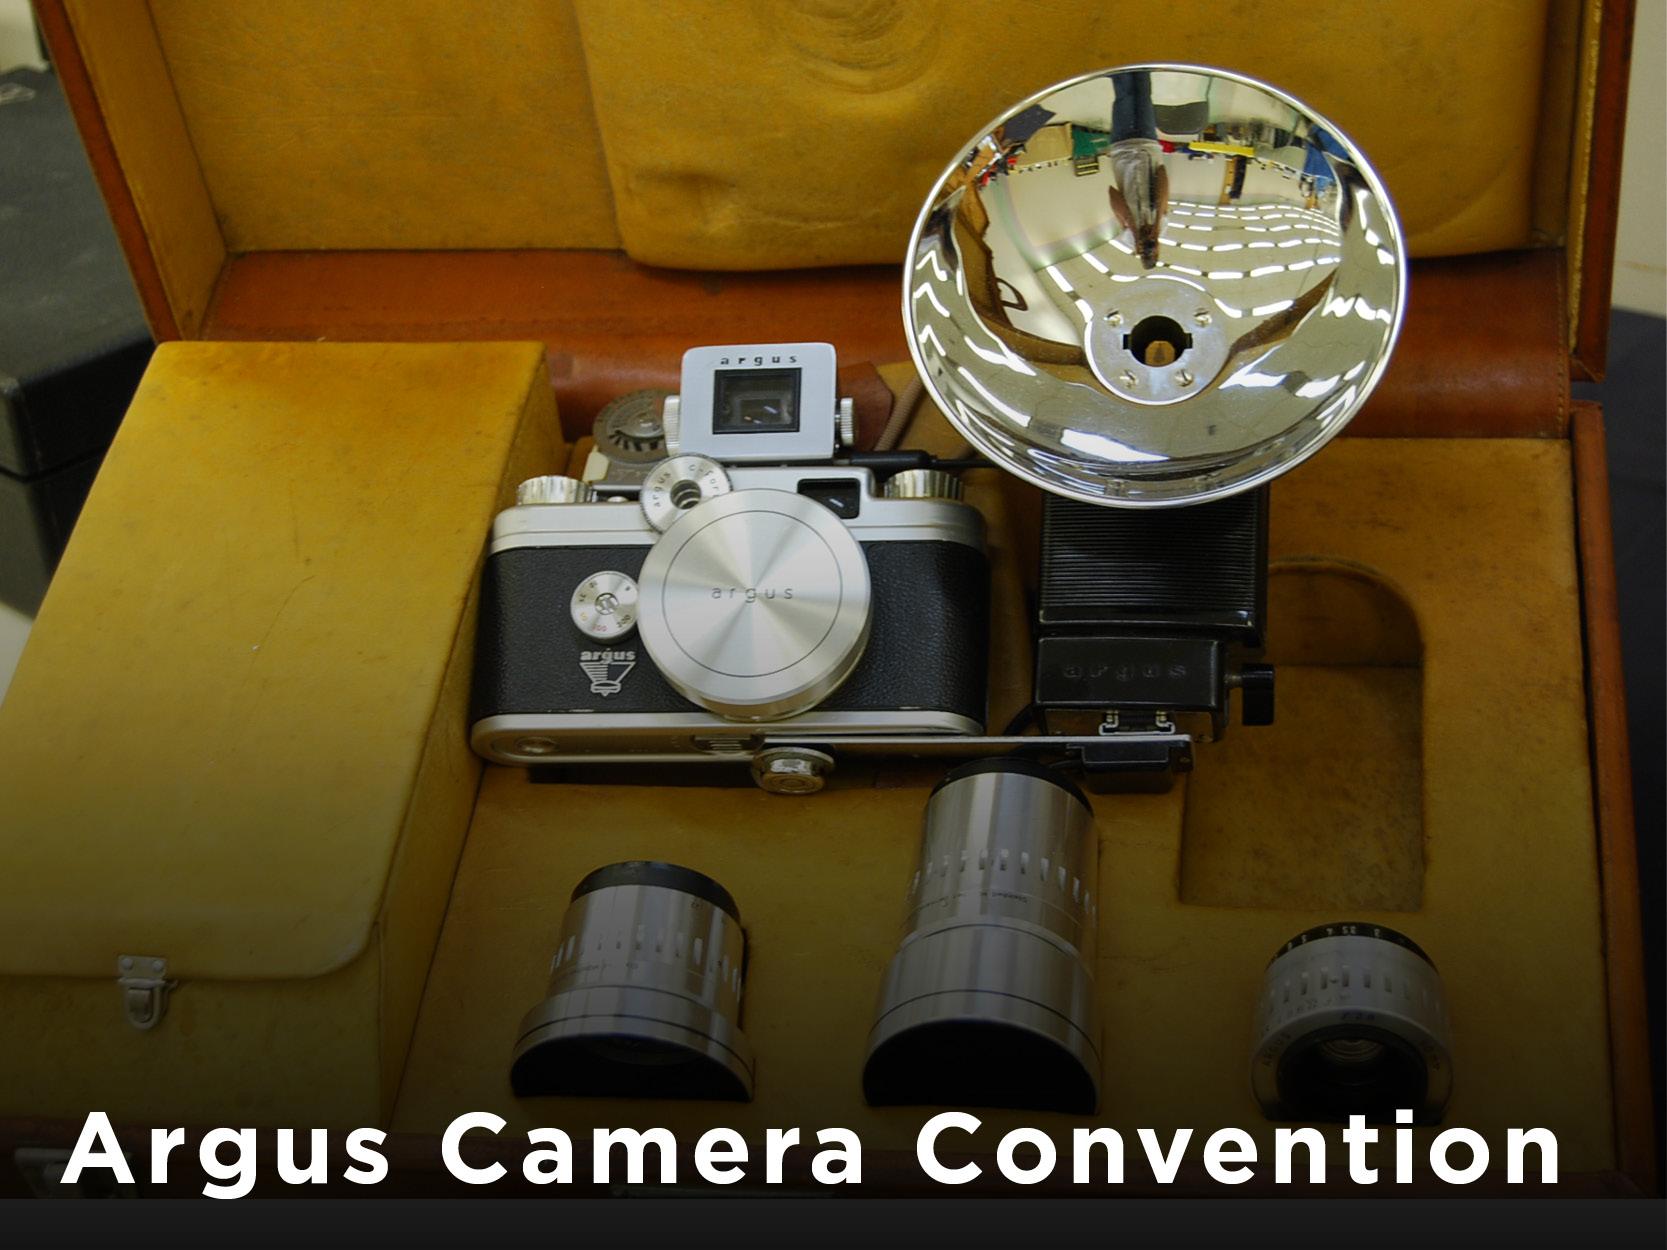 Argus Camera Convention